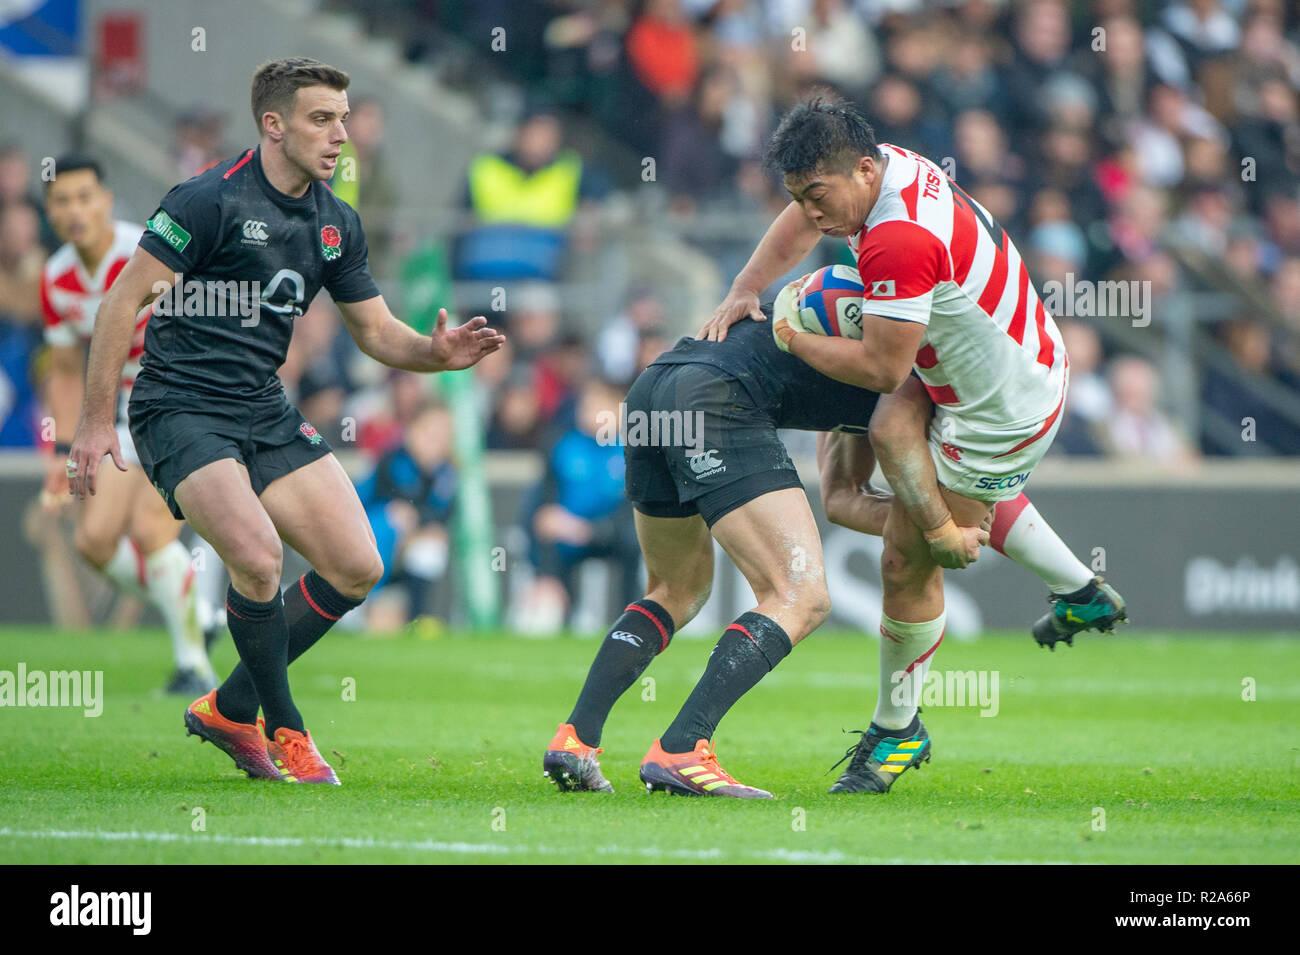 966769cac79 Twickenham, United Kingdom, Saturday, 17th November 2018, RFU, Rugby,  Stadium, England, Quilter Autumn International, England vs Japan, © Peter  Spur